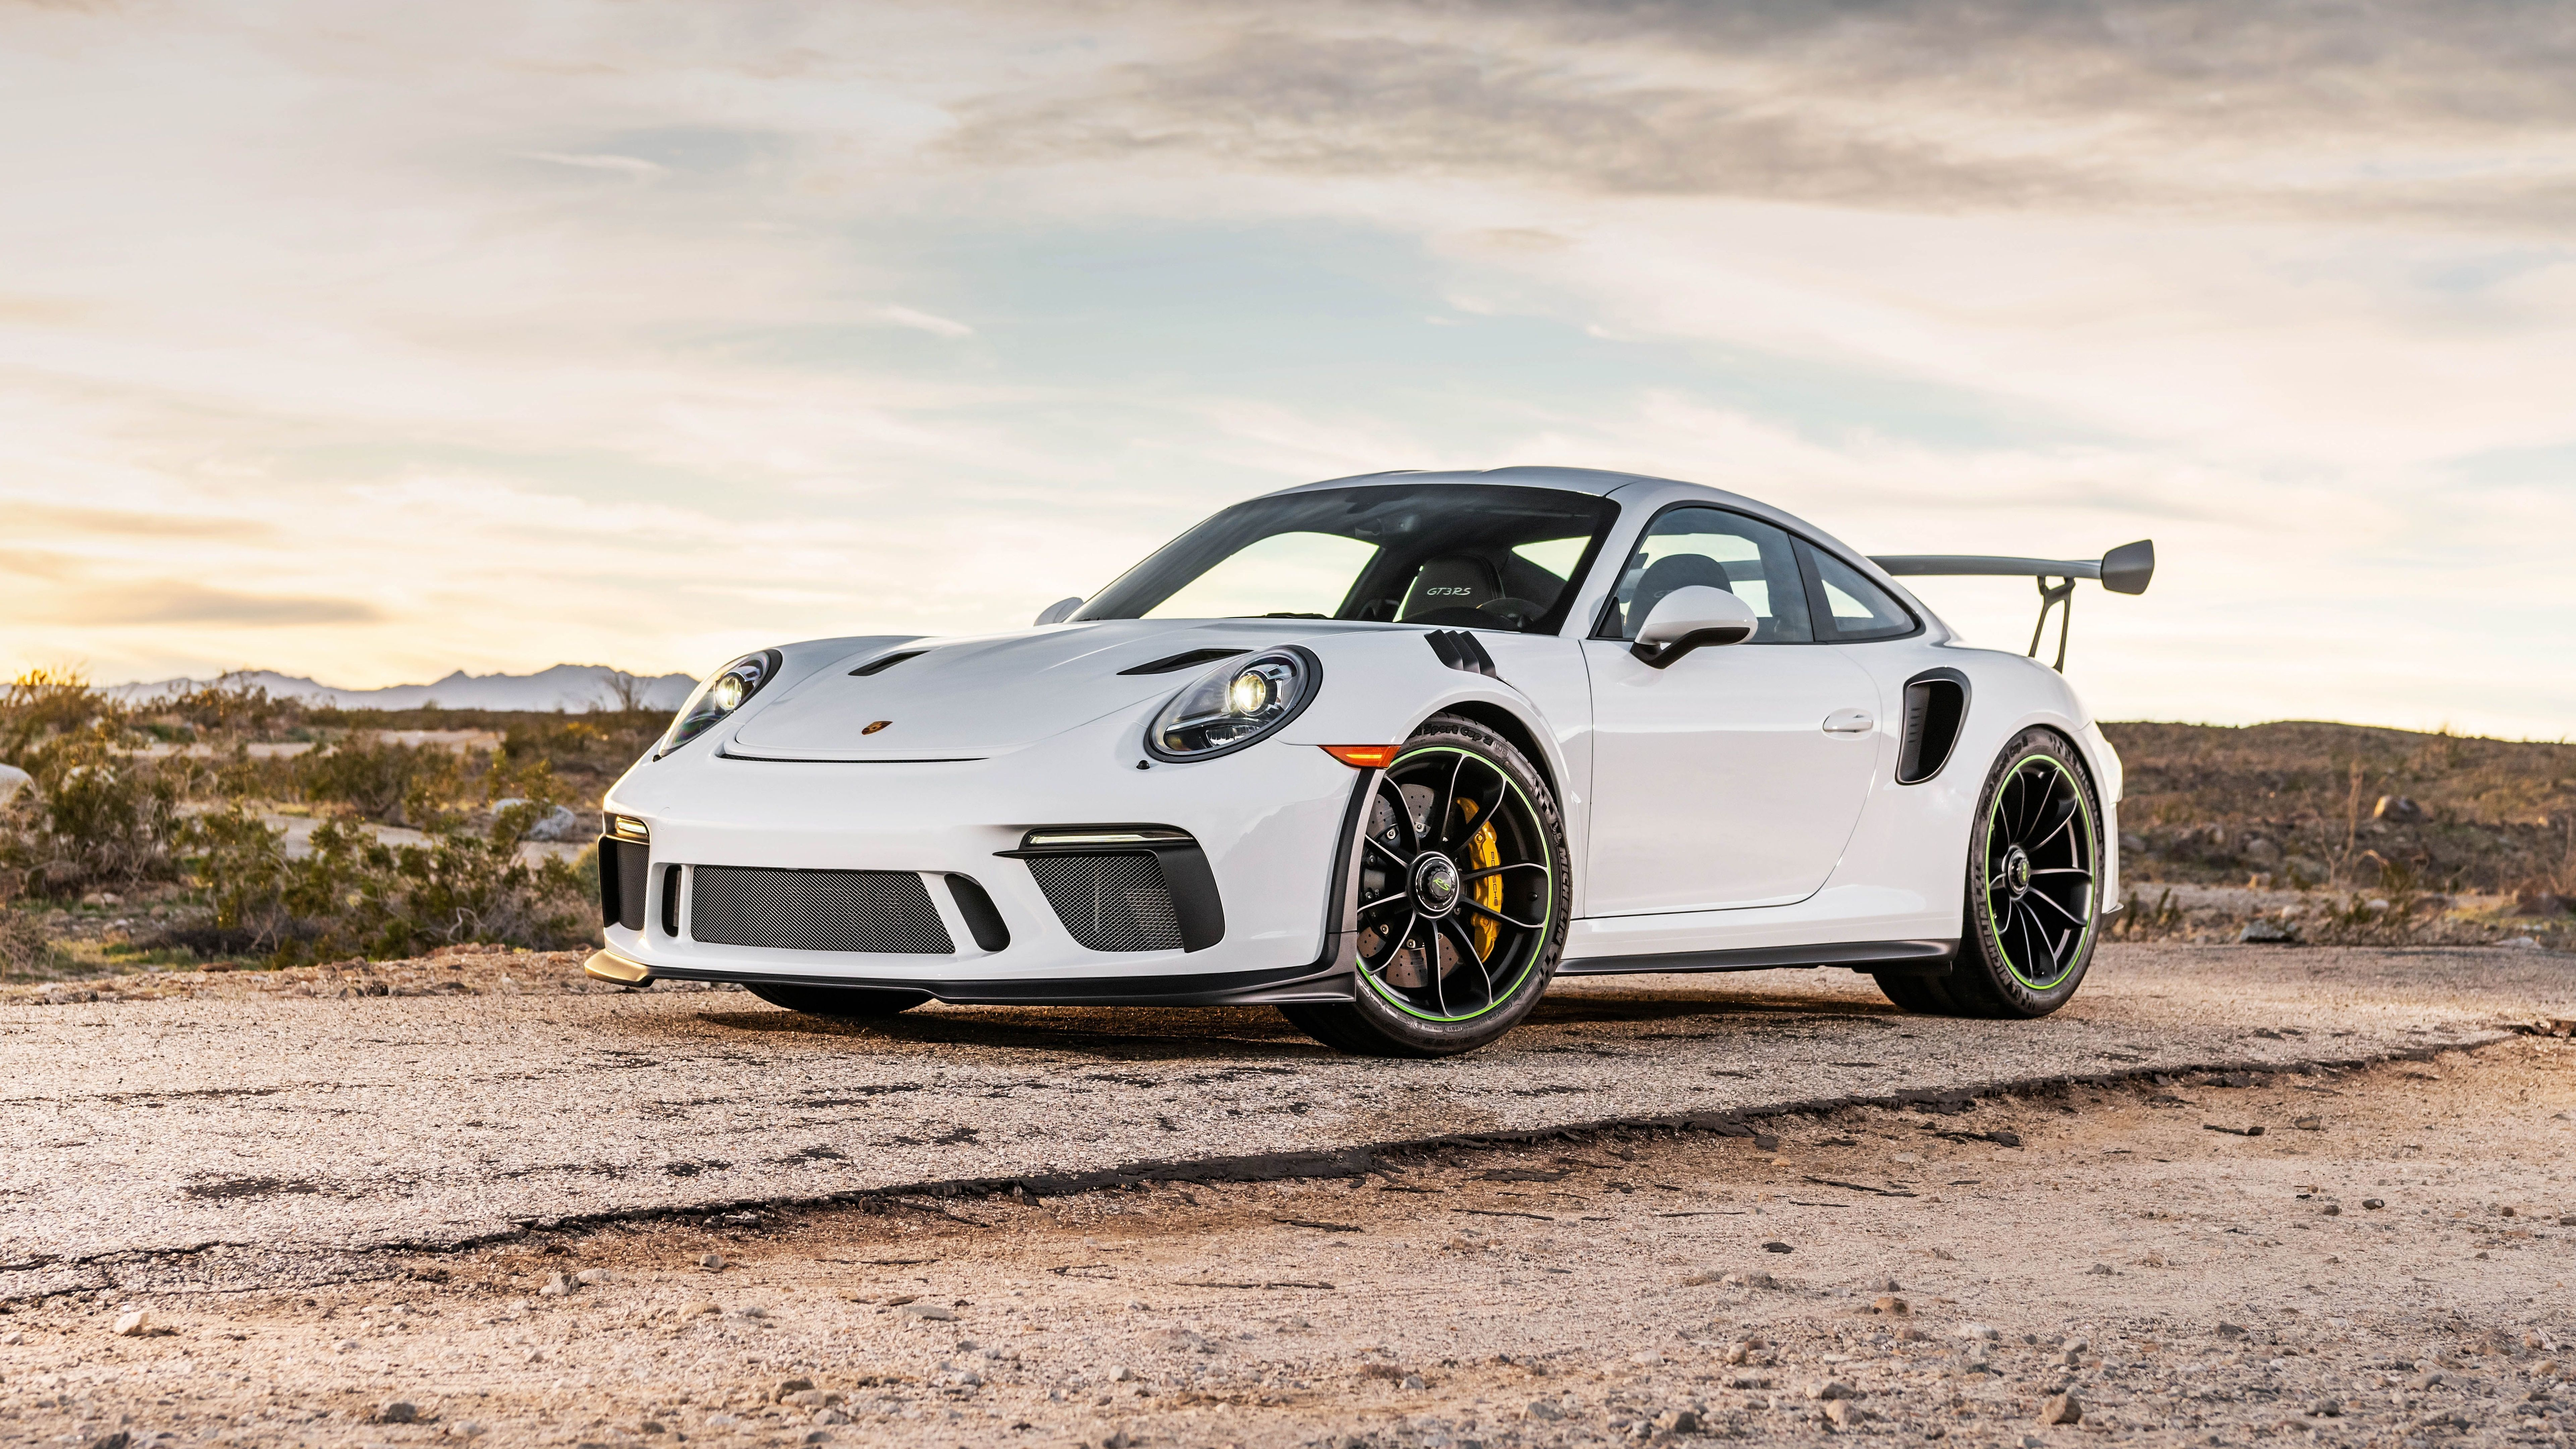 8K Resolution Car Wallpapers - Top Free 8K Resolution Car ...